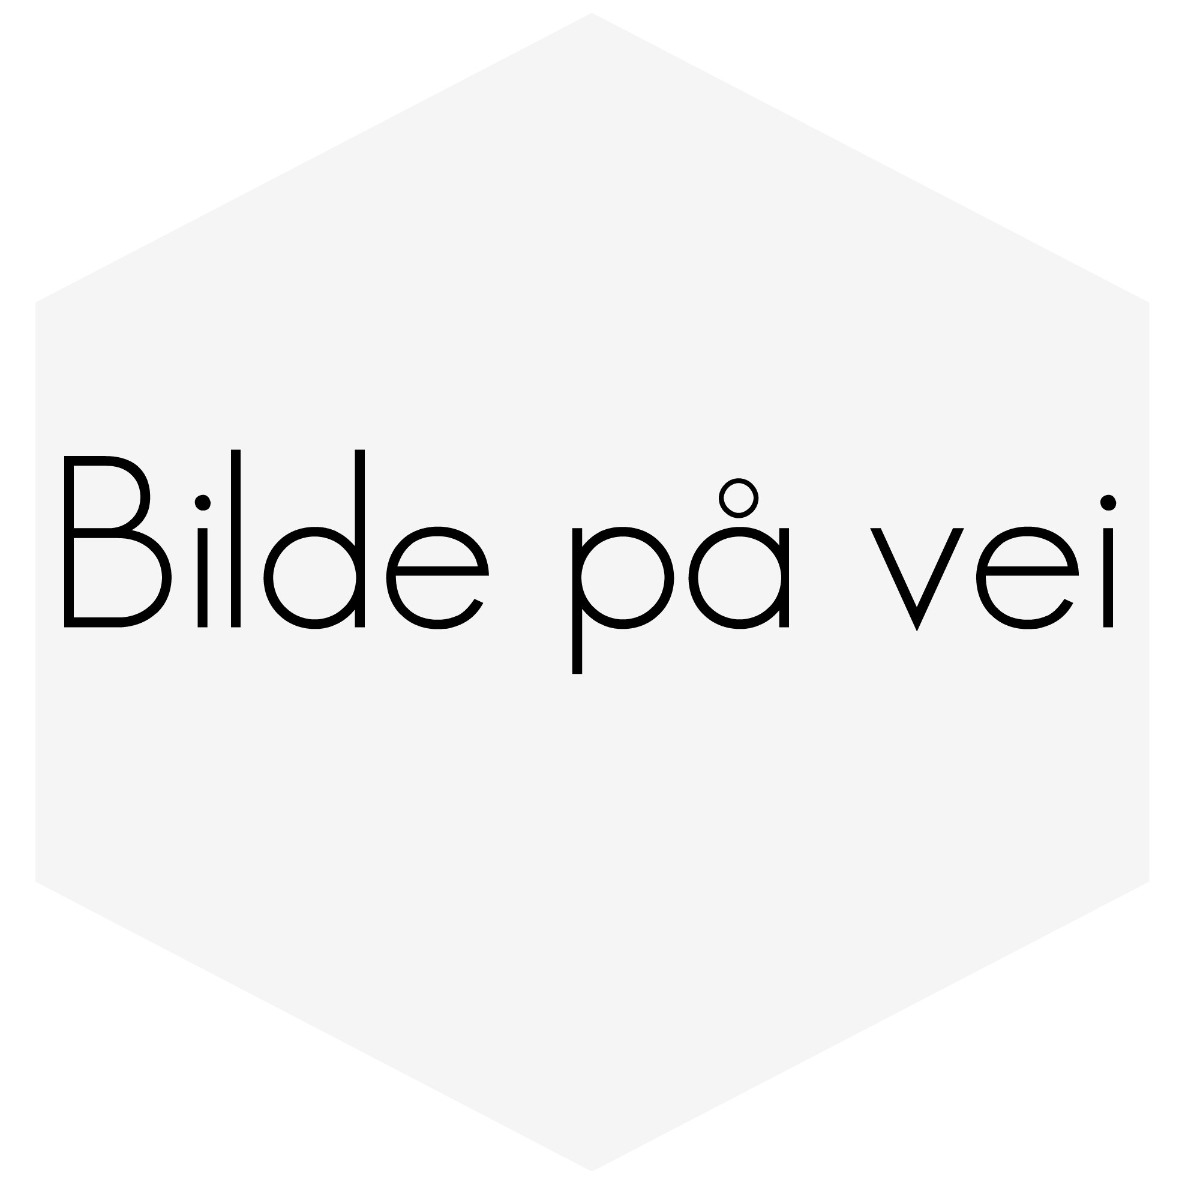 EKSOSANLEGG SPORT HALVSATS AUDI TT QUATTRO 98-07MOD